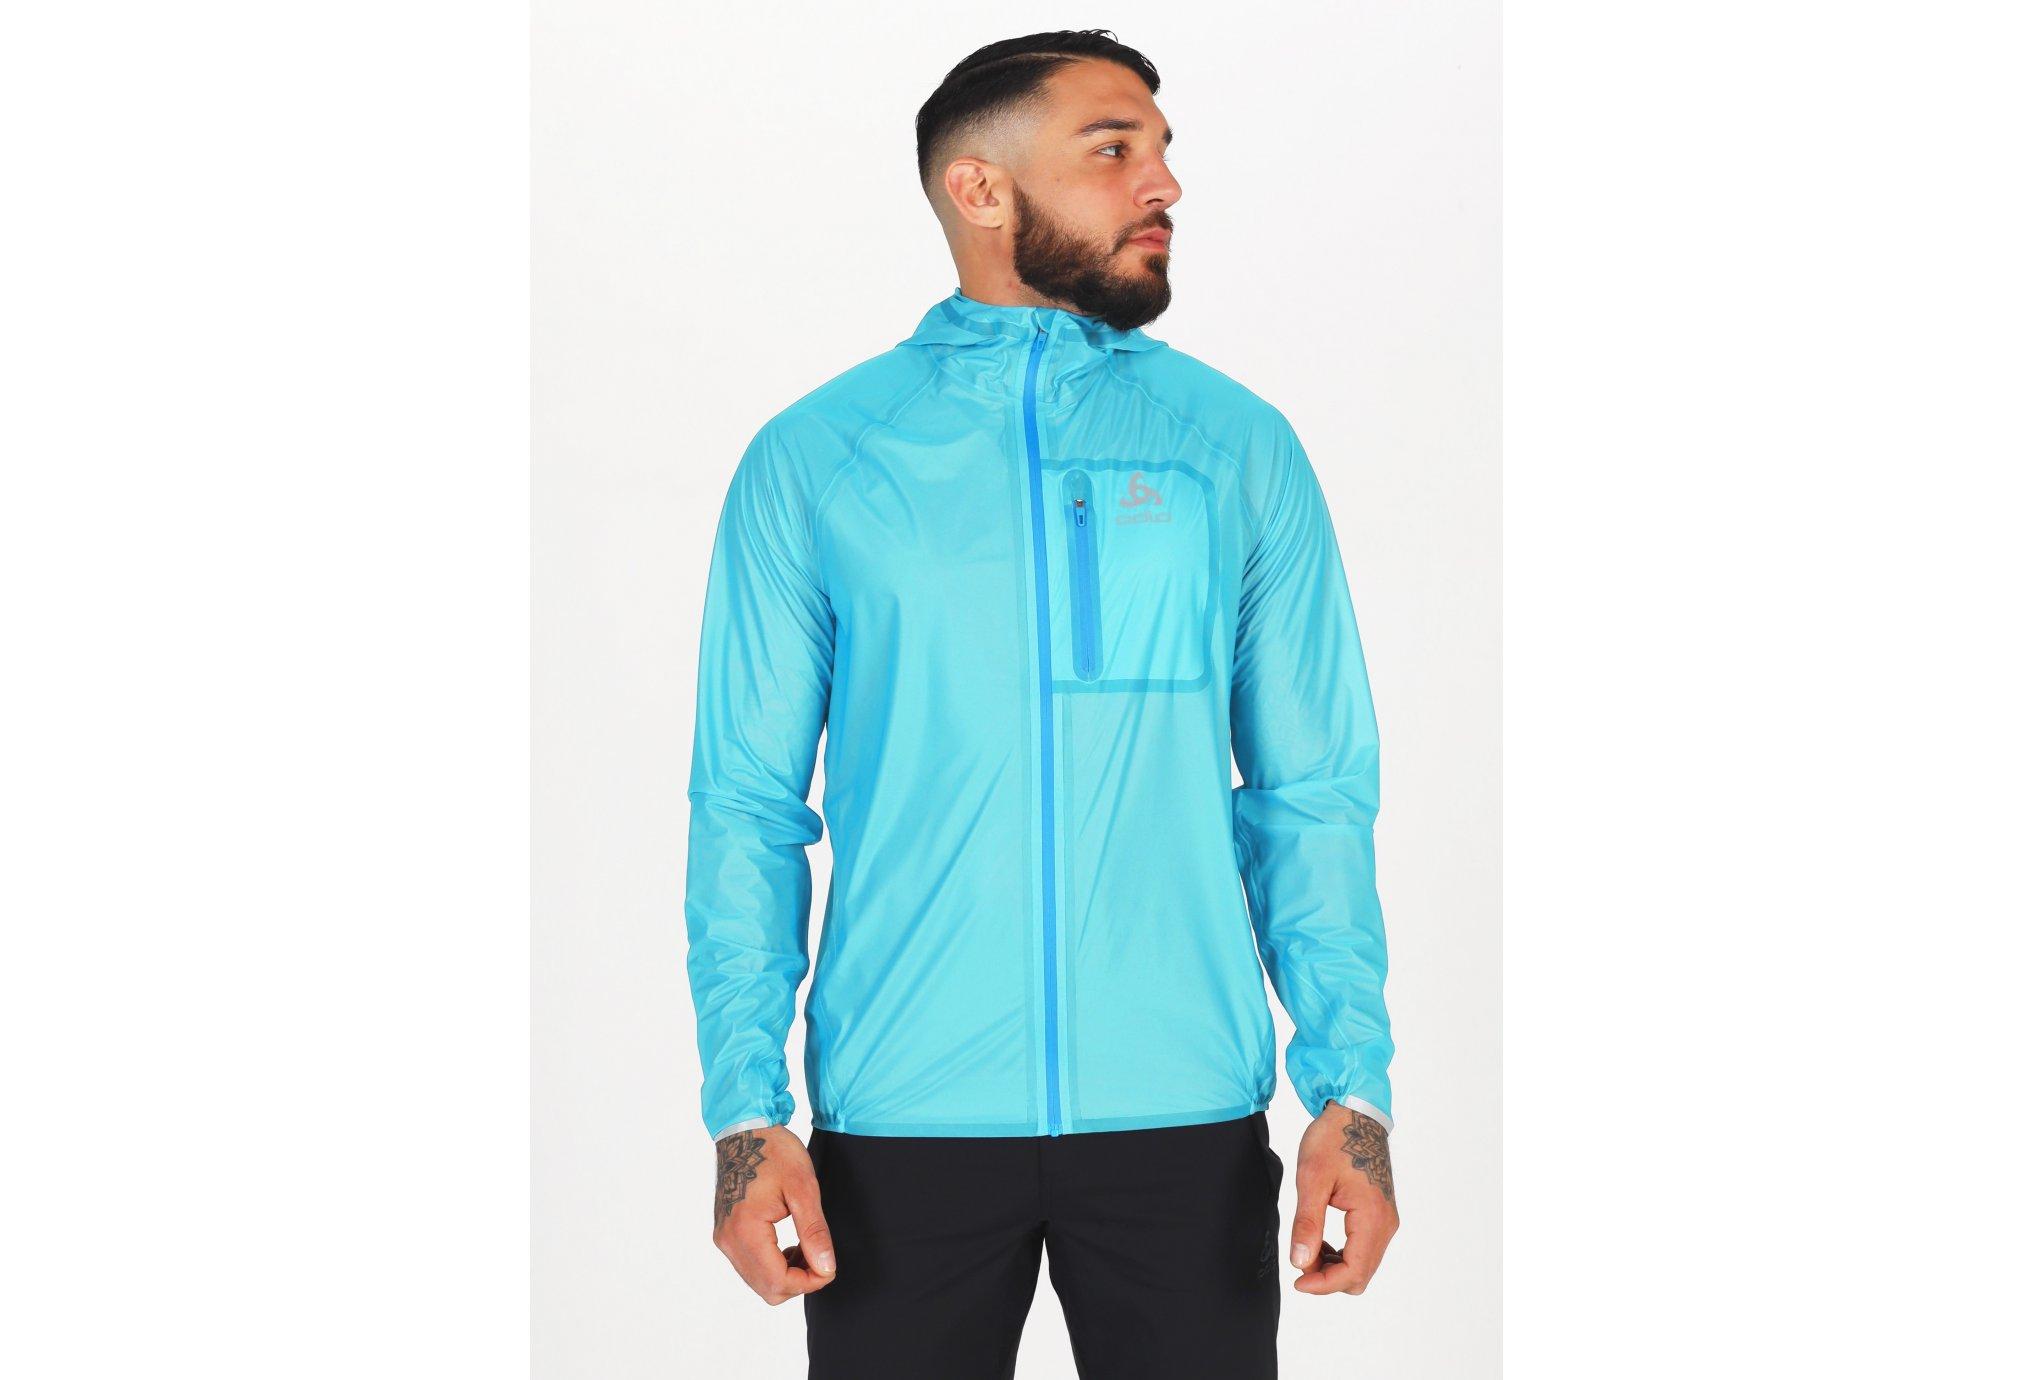 Odlo Zeroweight Dual Dry Waterproof M vêtement running homme